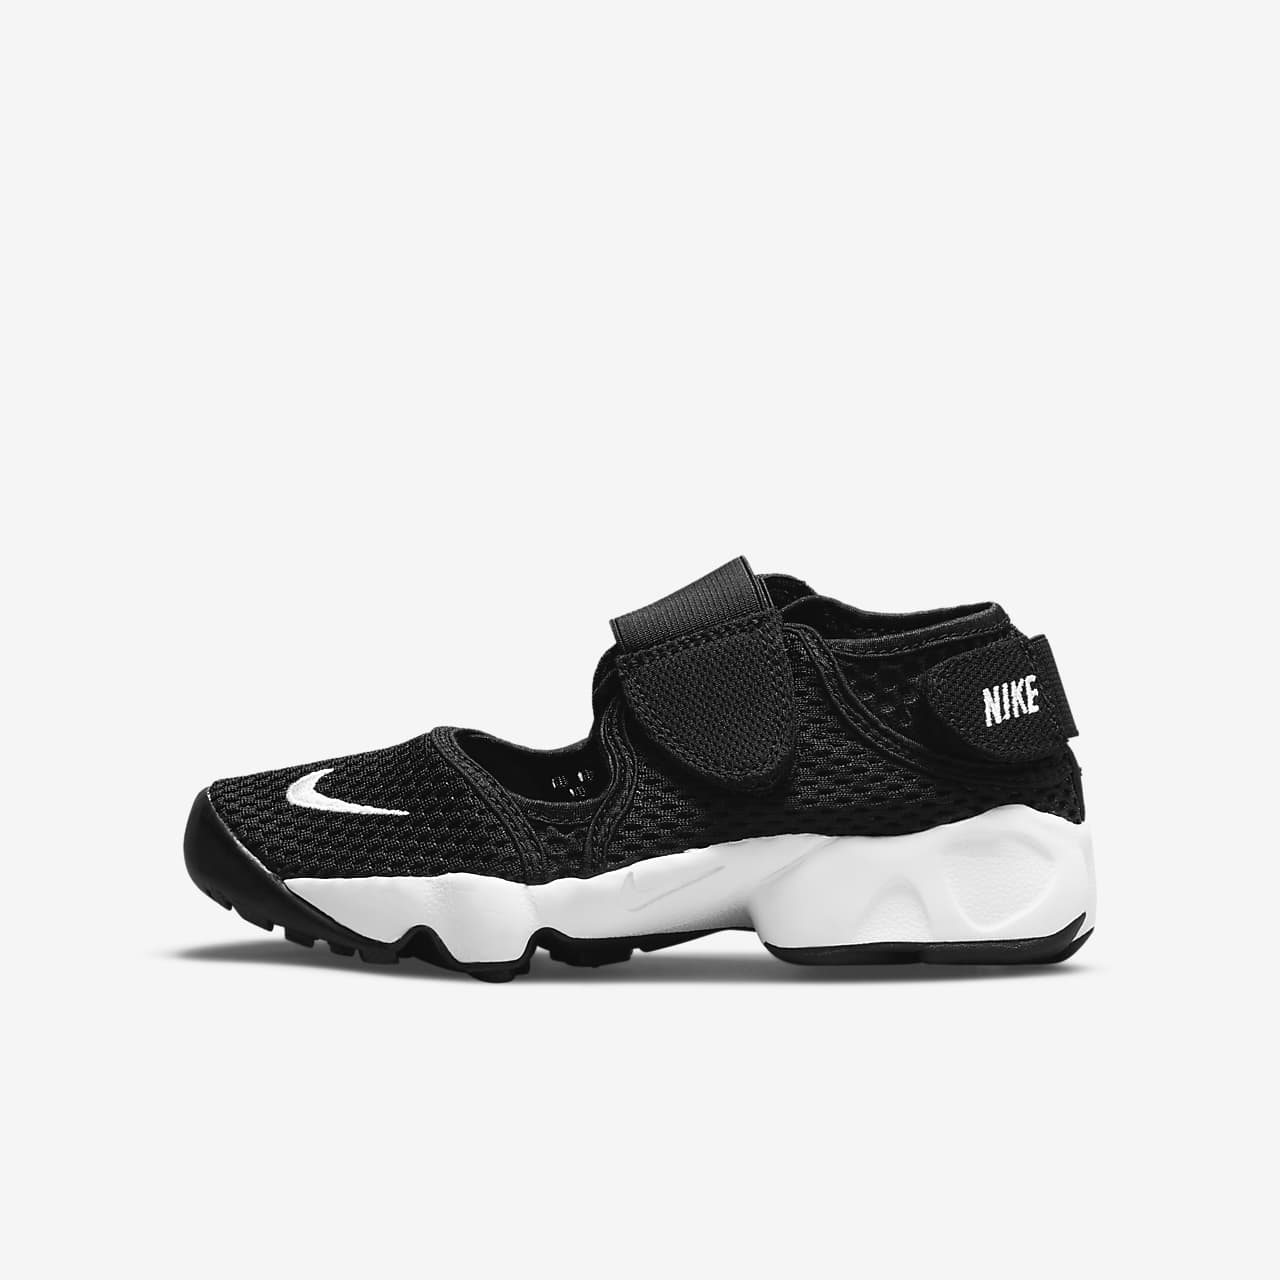 scarpe nike bimbo 27